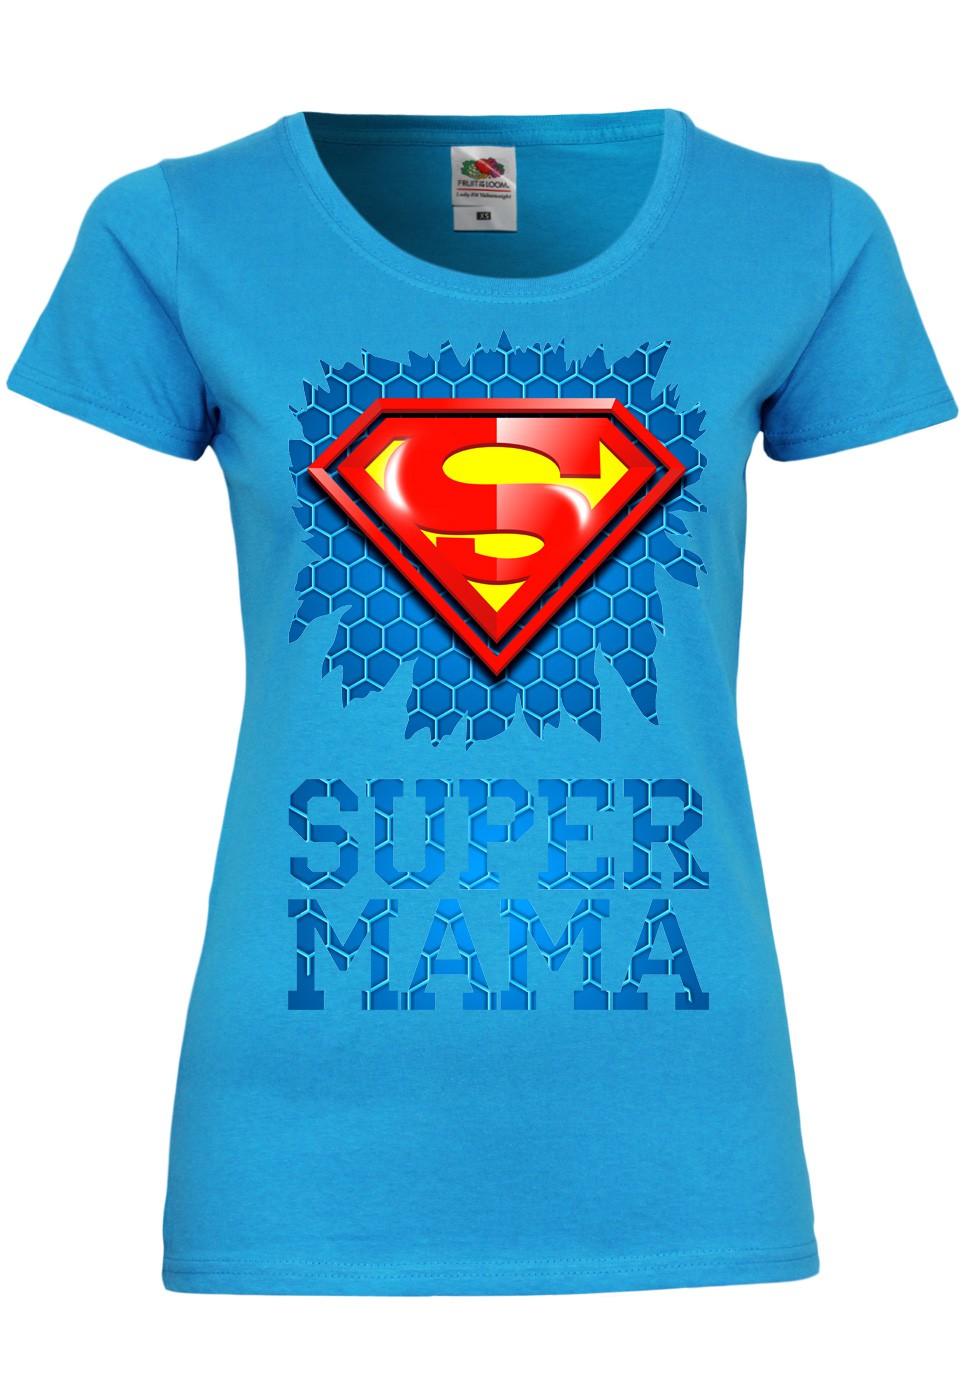 M135 F288N Damen T-Shirt mit Motiv Super MamaMuttertag Geschenk Print Kurzarm